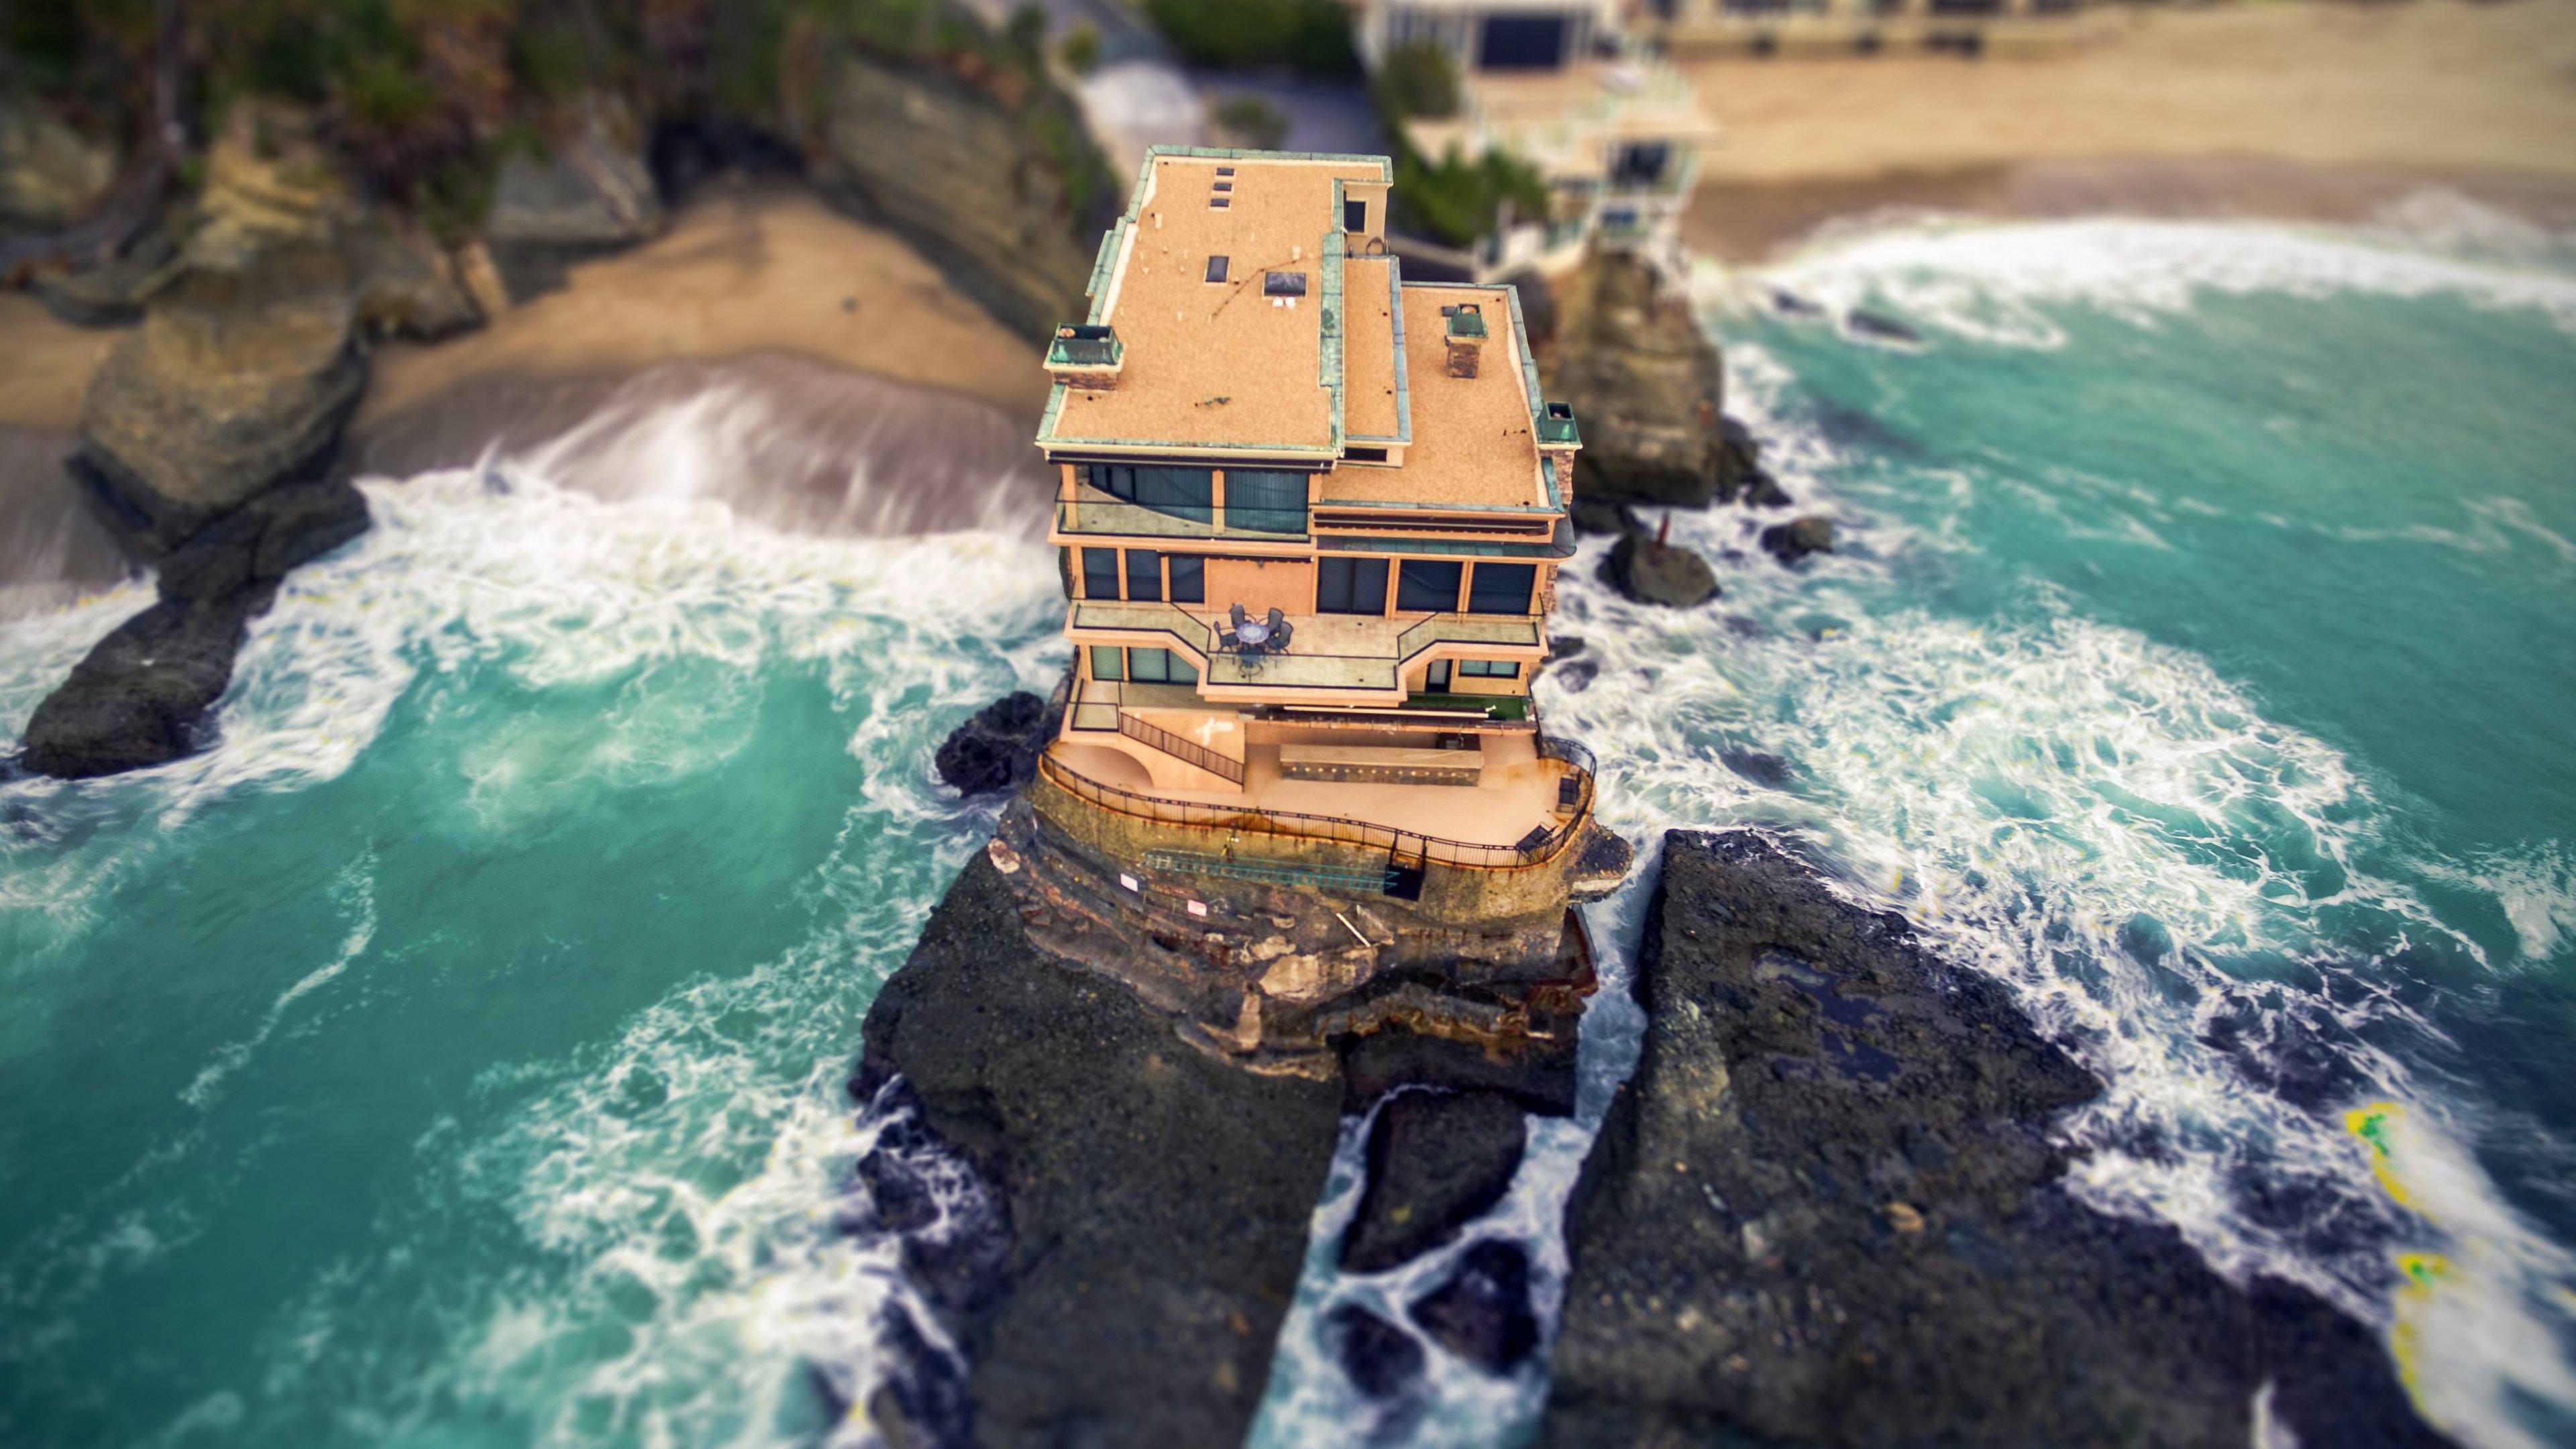 Beach House 4K wallpaper 3840x2160